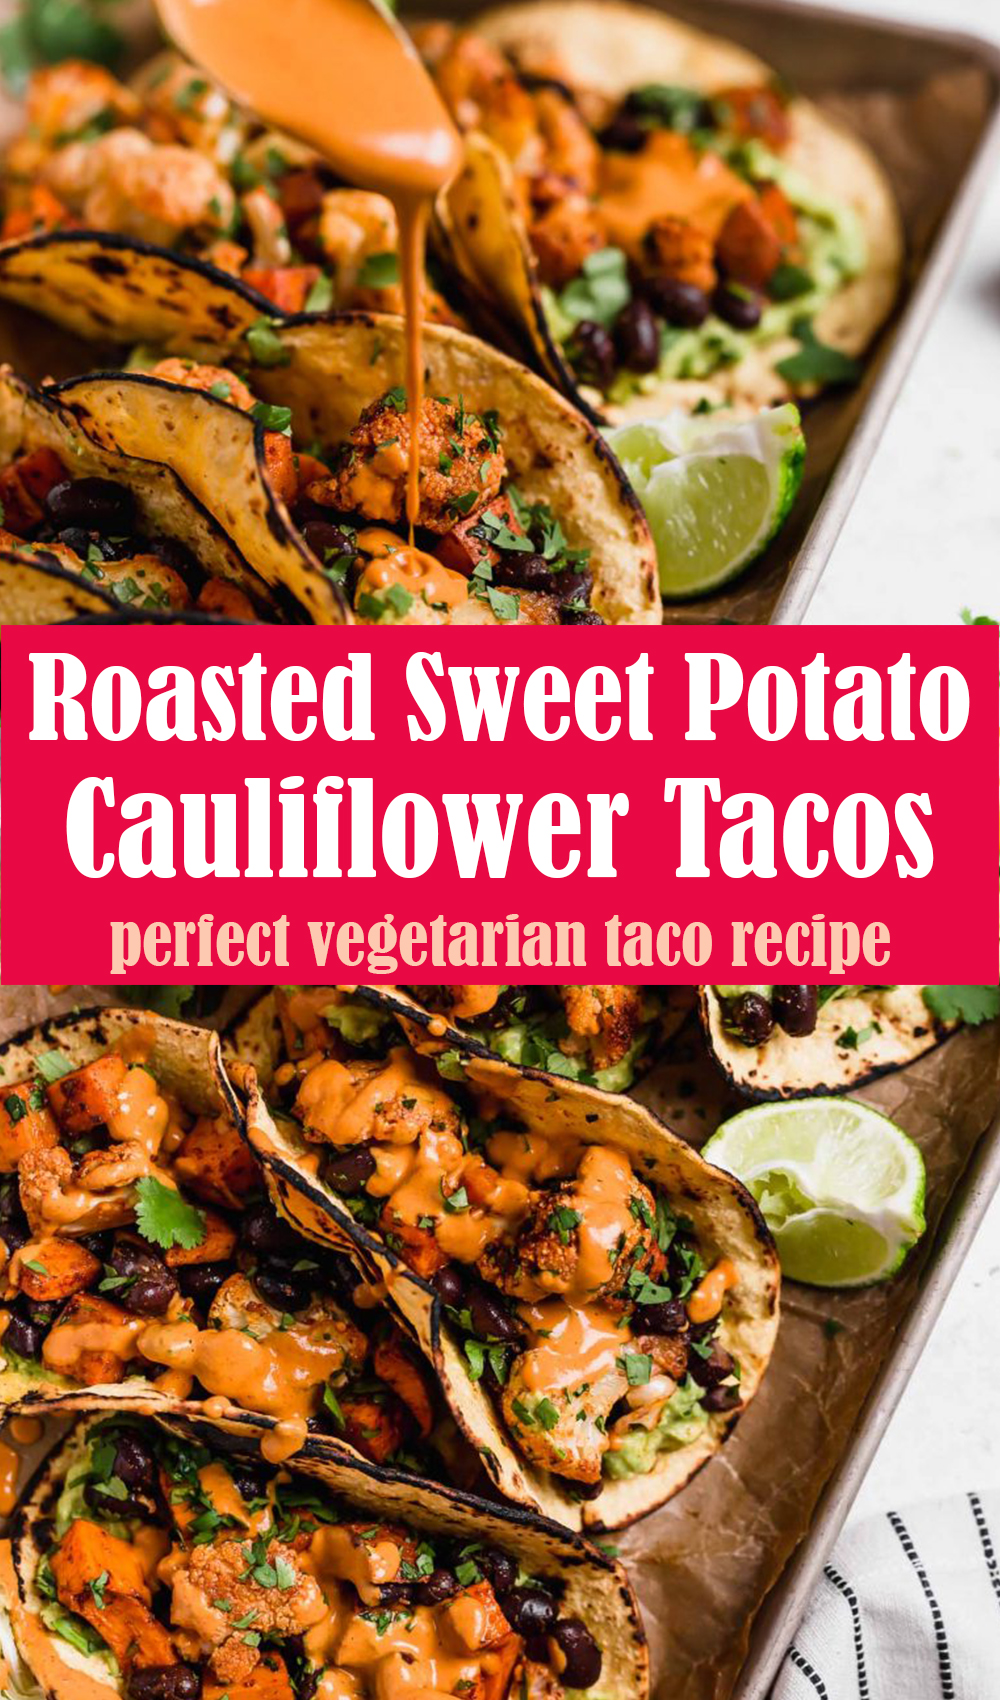 Roasted Sweet Potato with Cauliflower Tacos Recipe